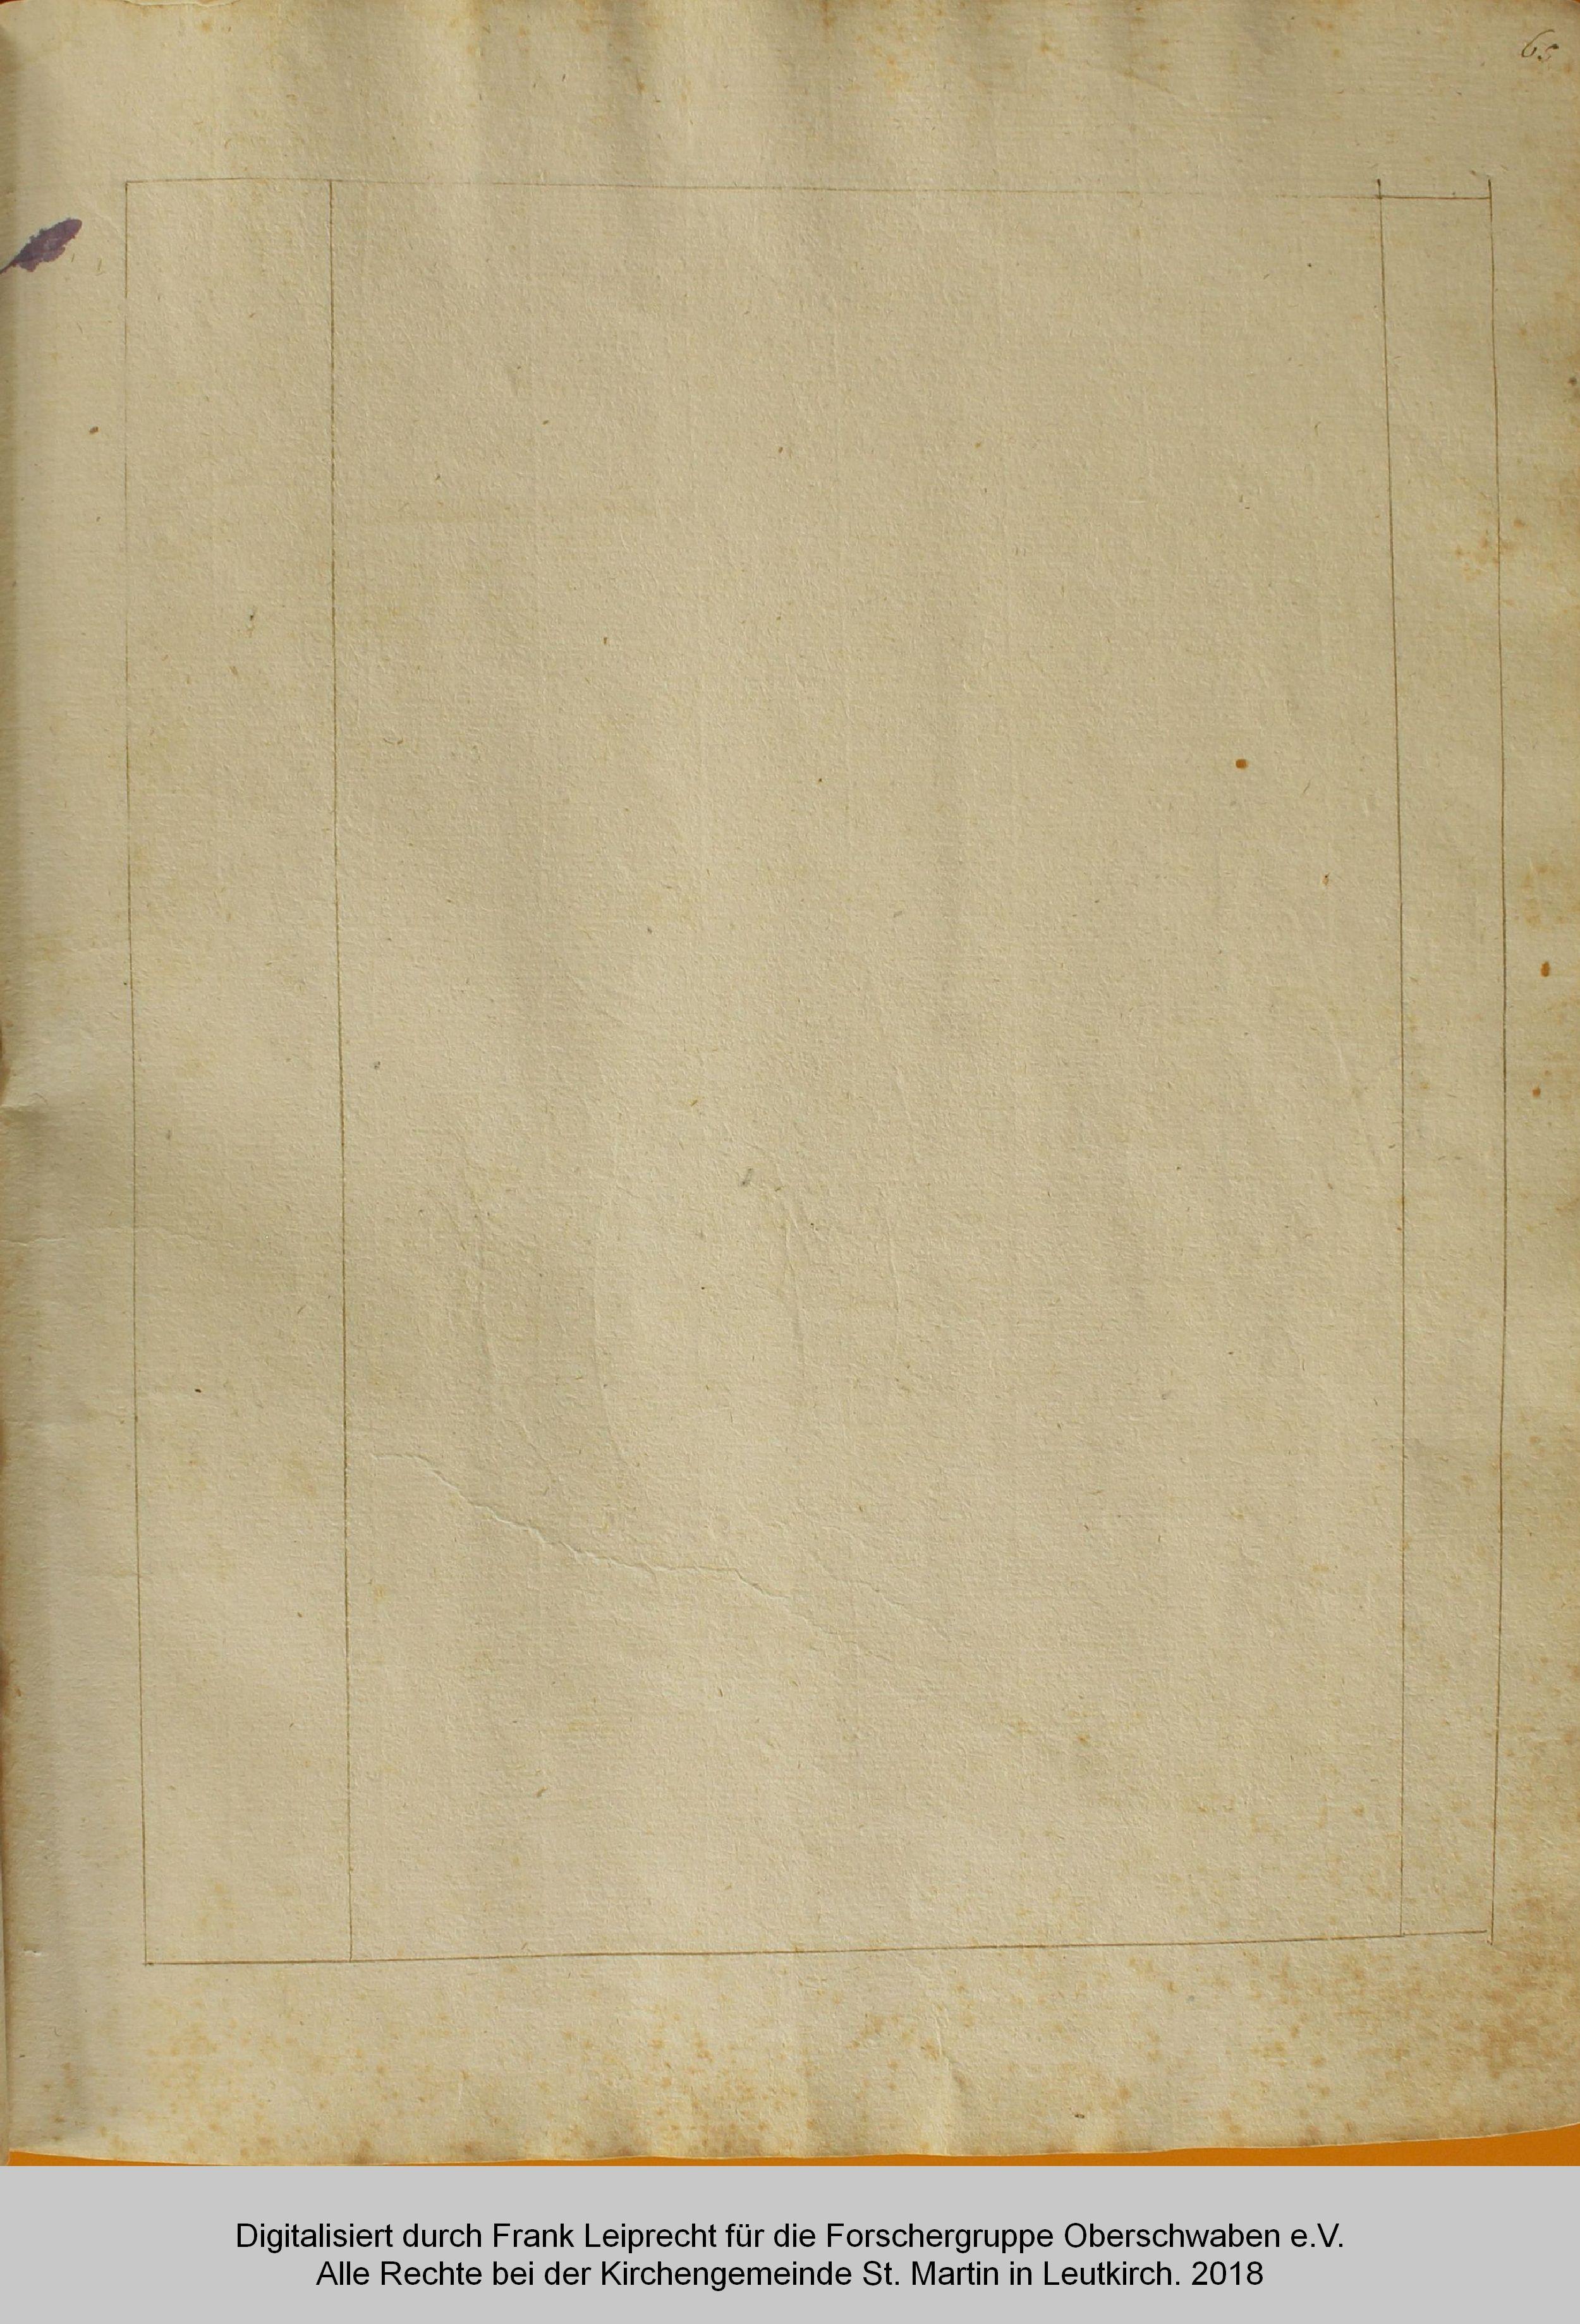 Seite 065